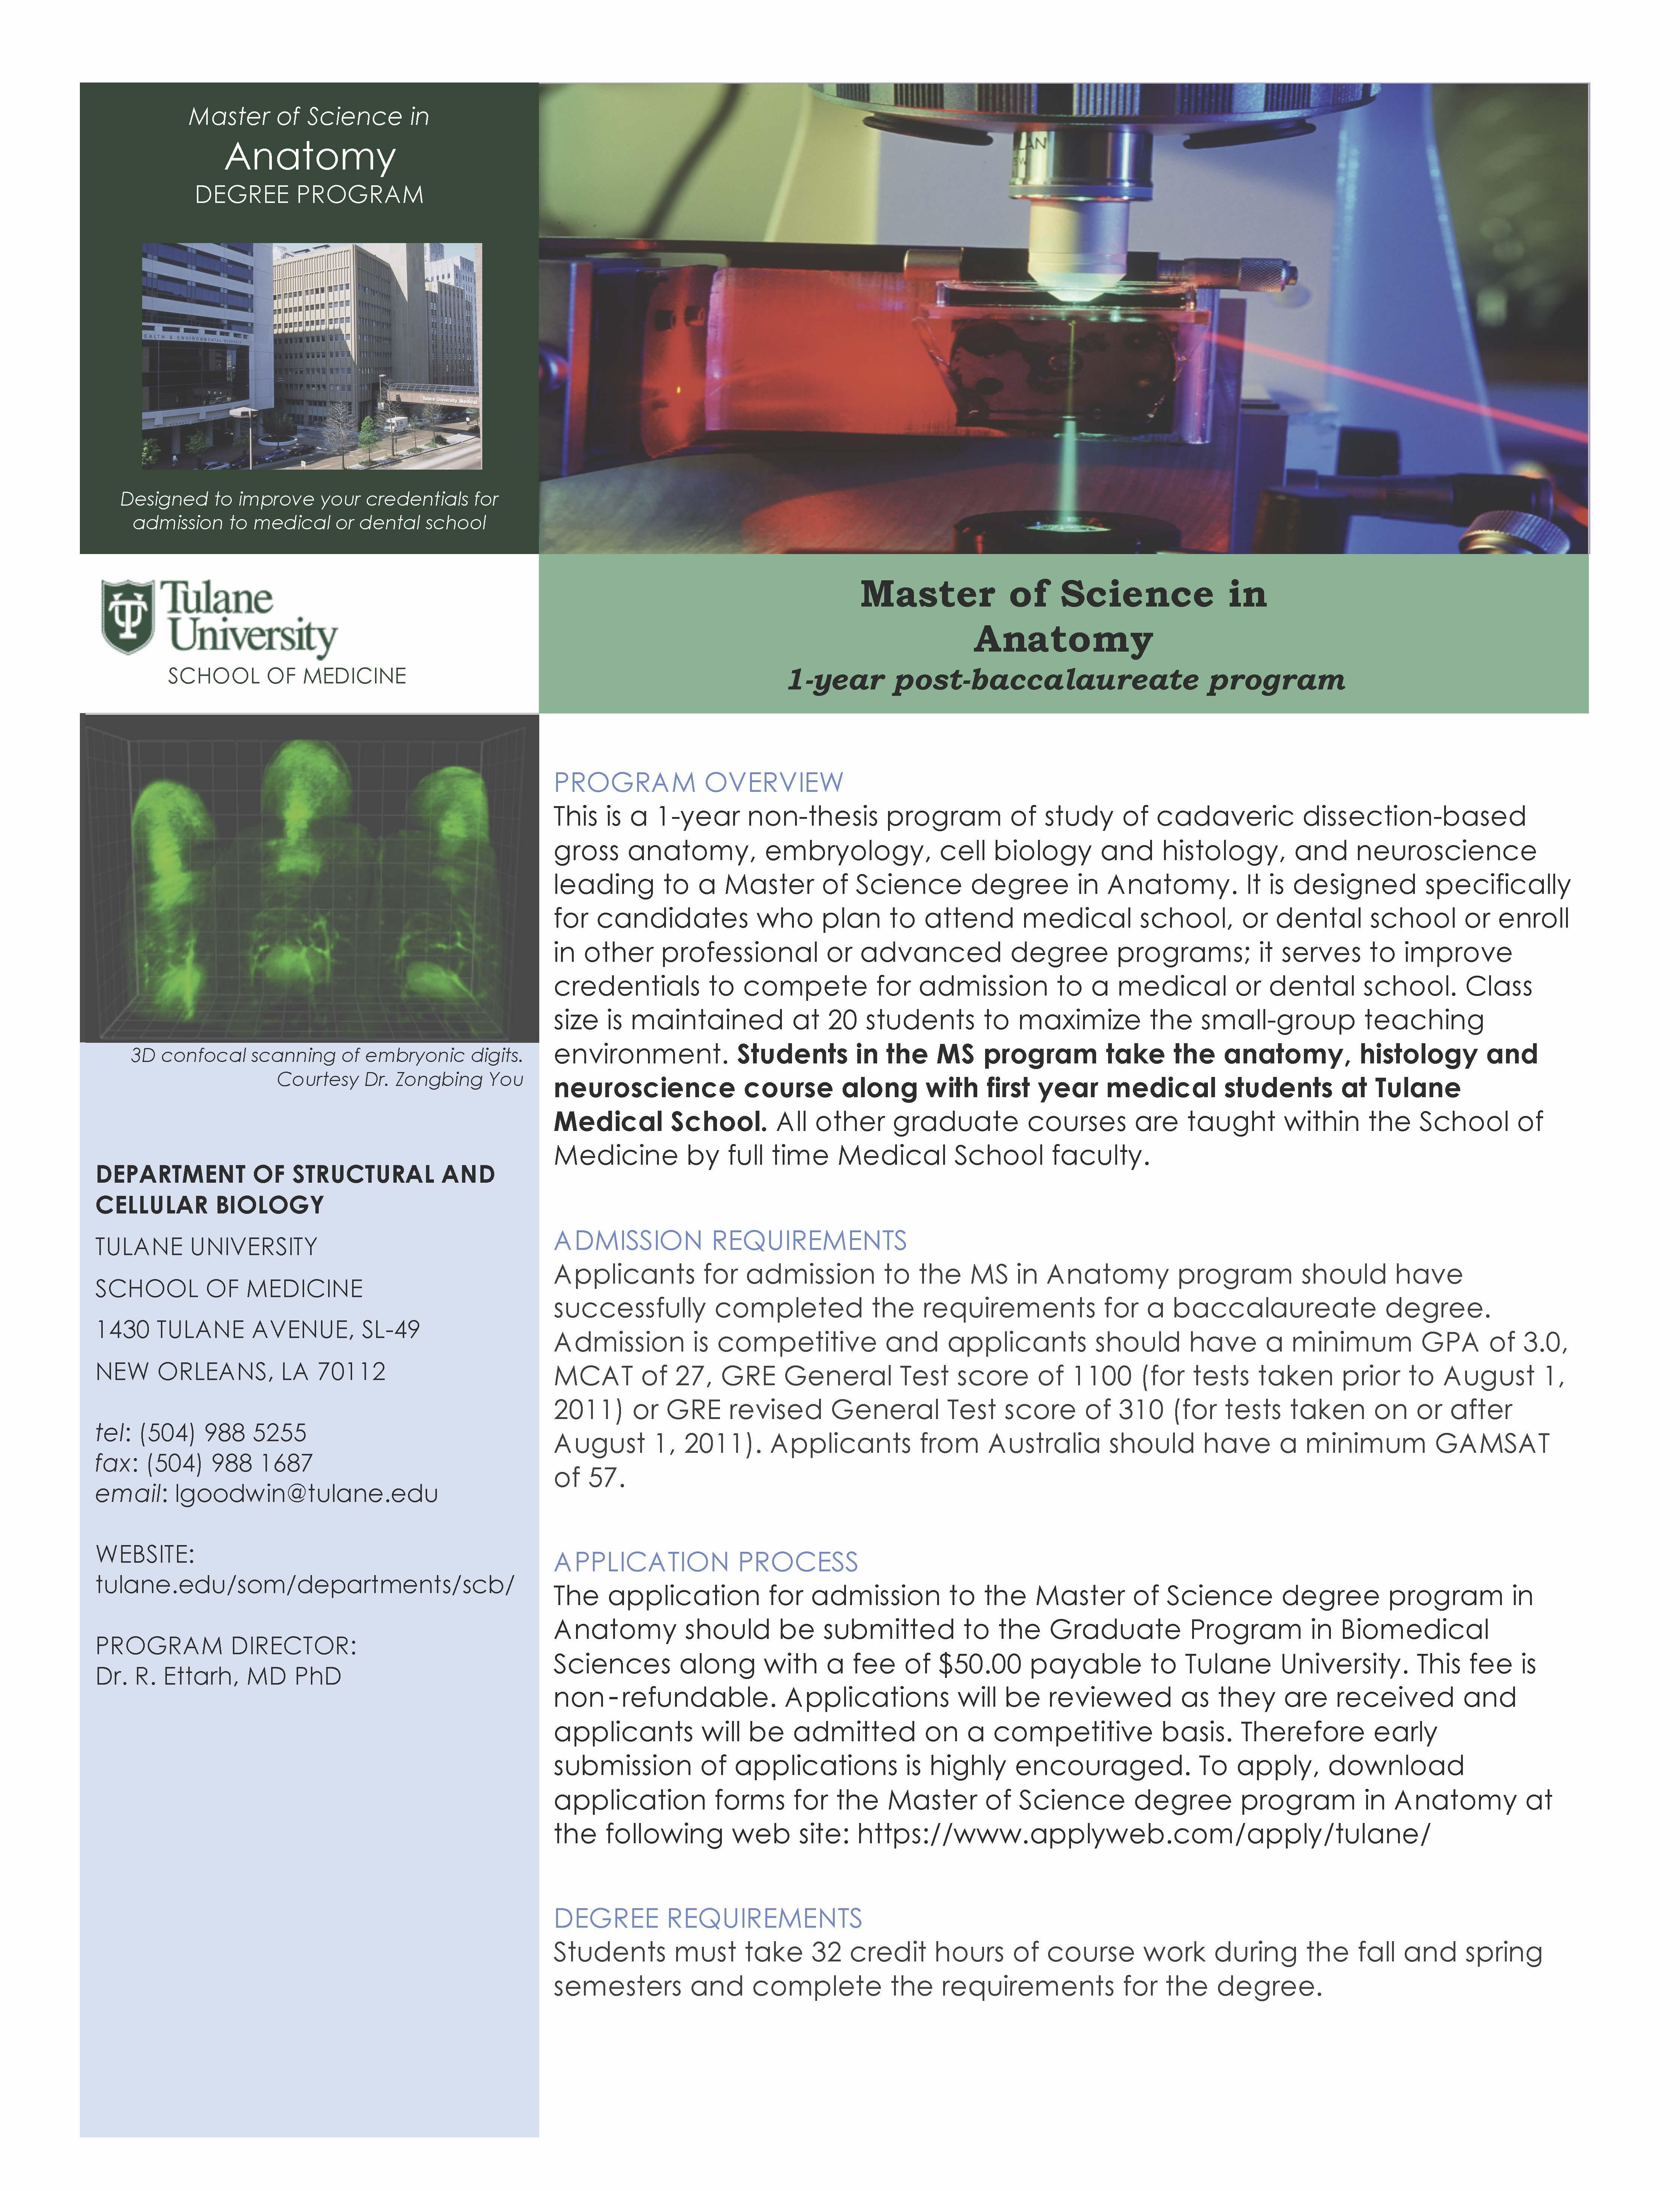 Tulane MS Anatomy | UC San Diego - Biology Bulletin